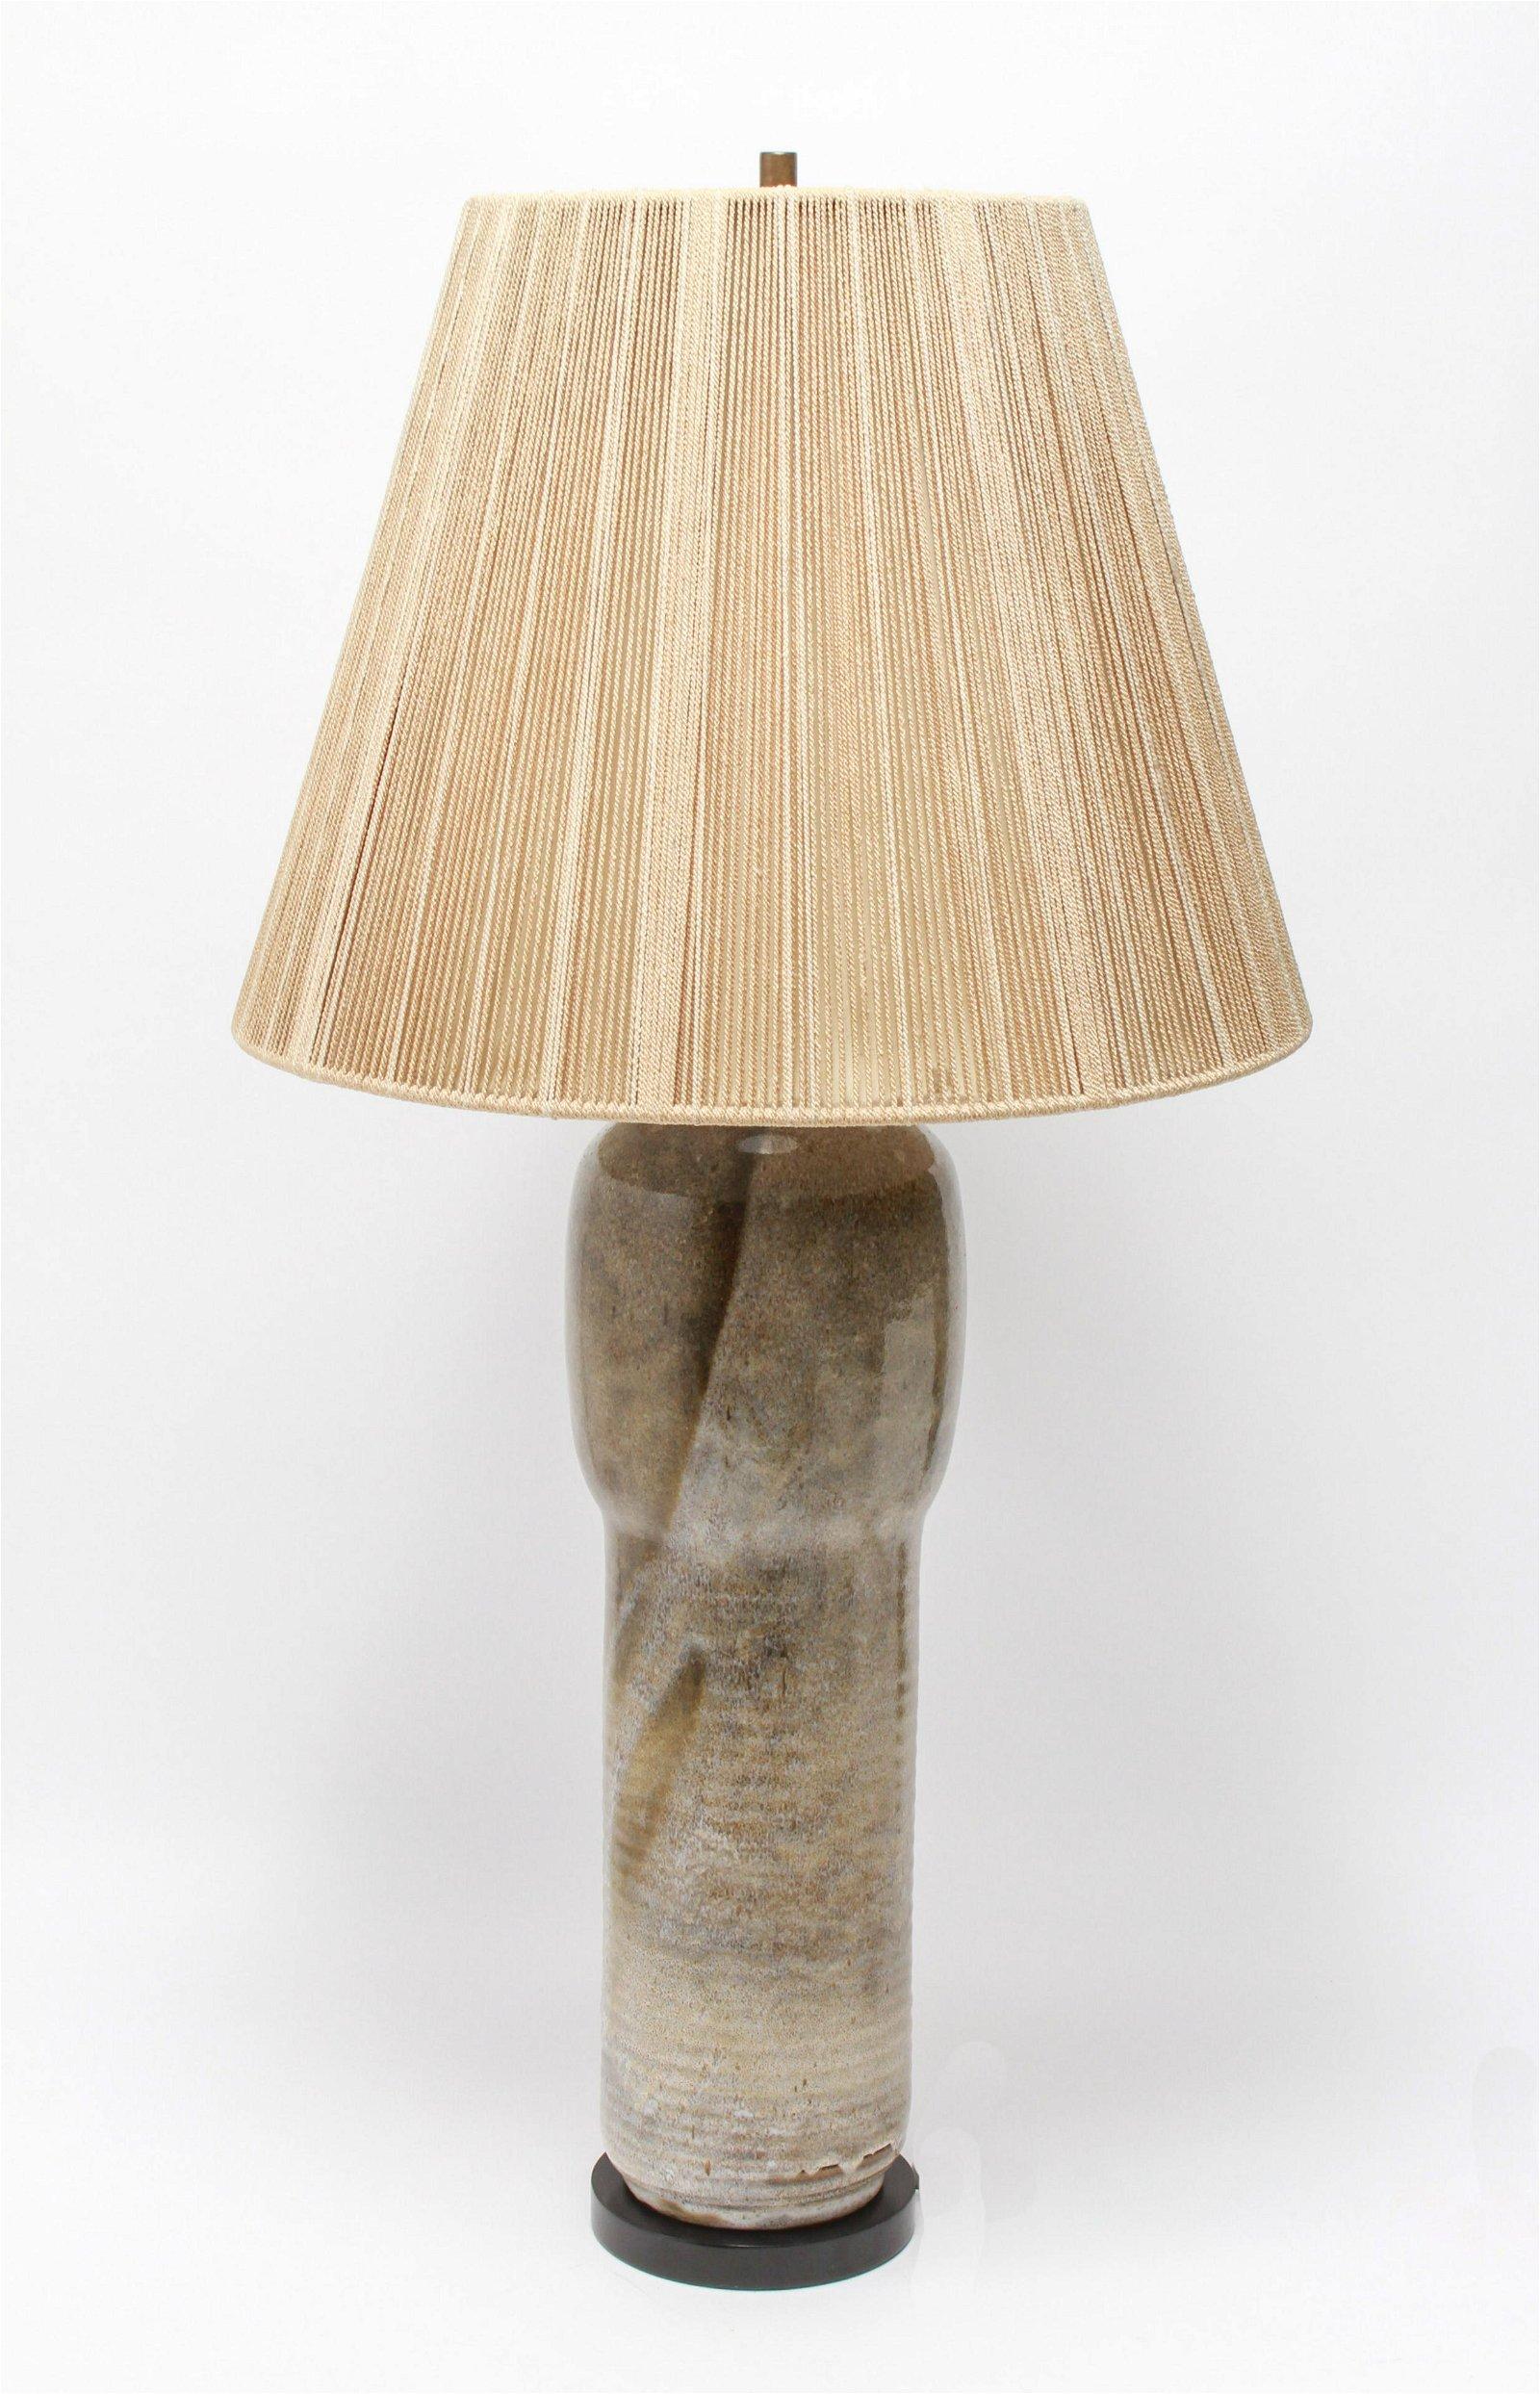 Karen Karnes Style Art Pottery Lamp w String Shade